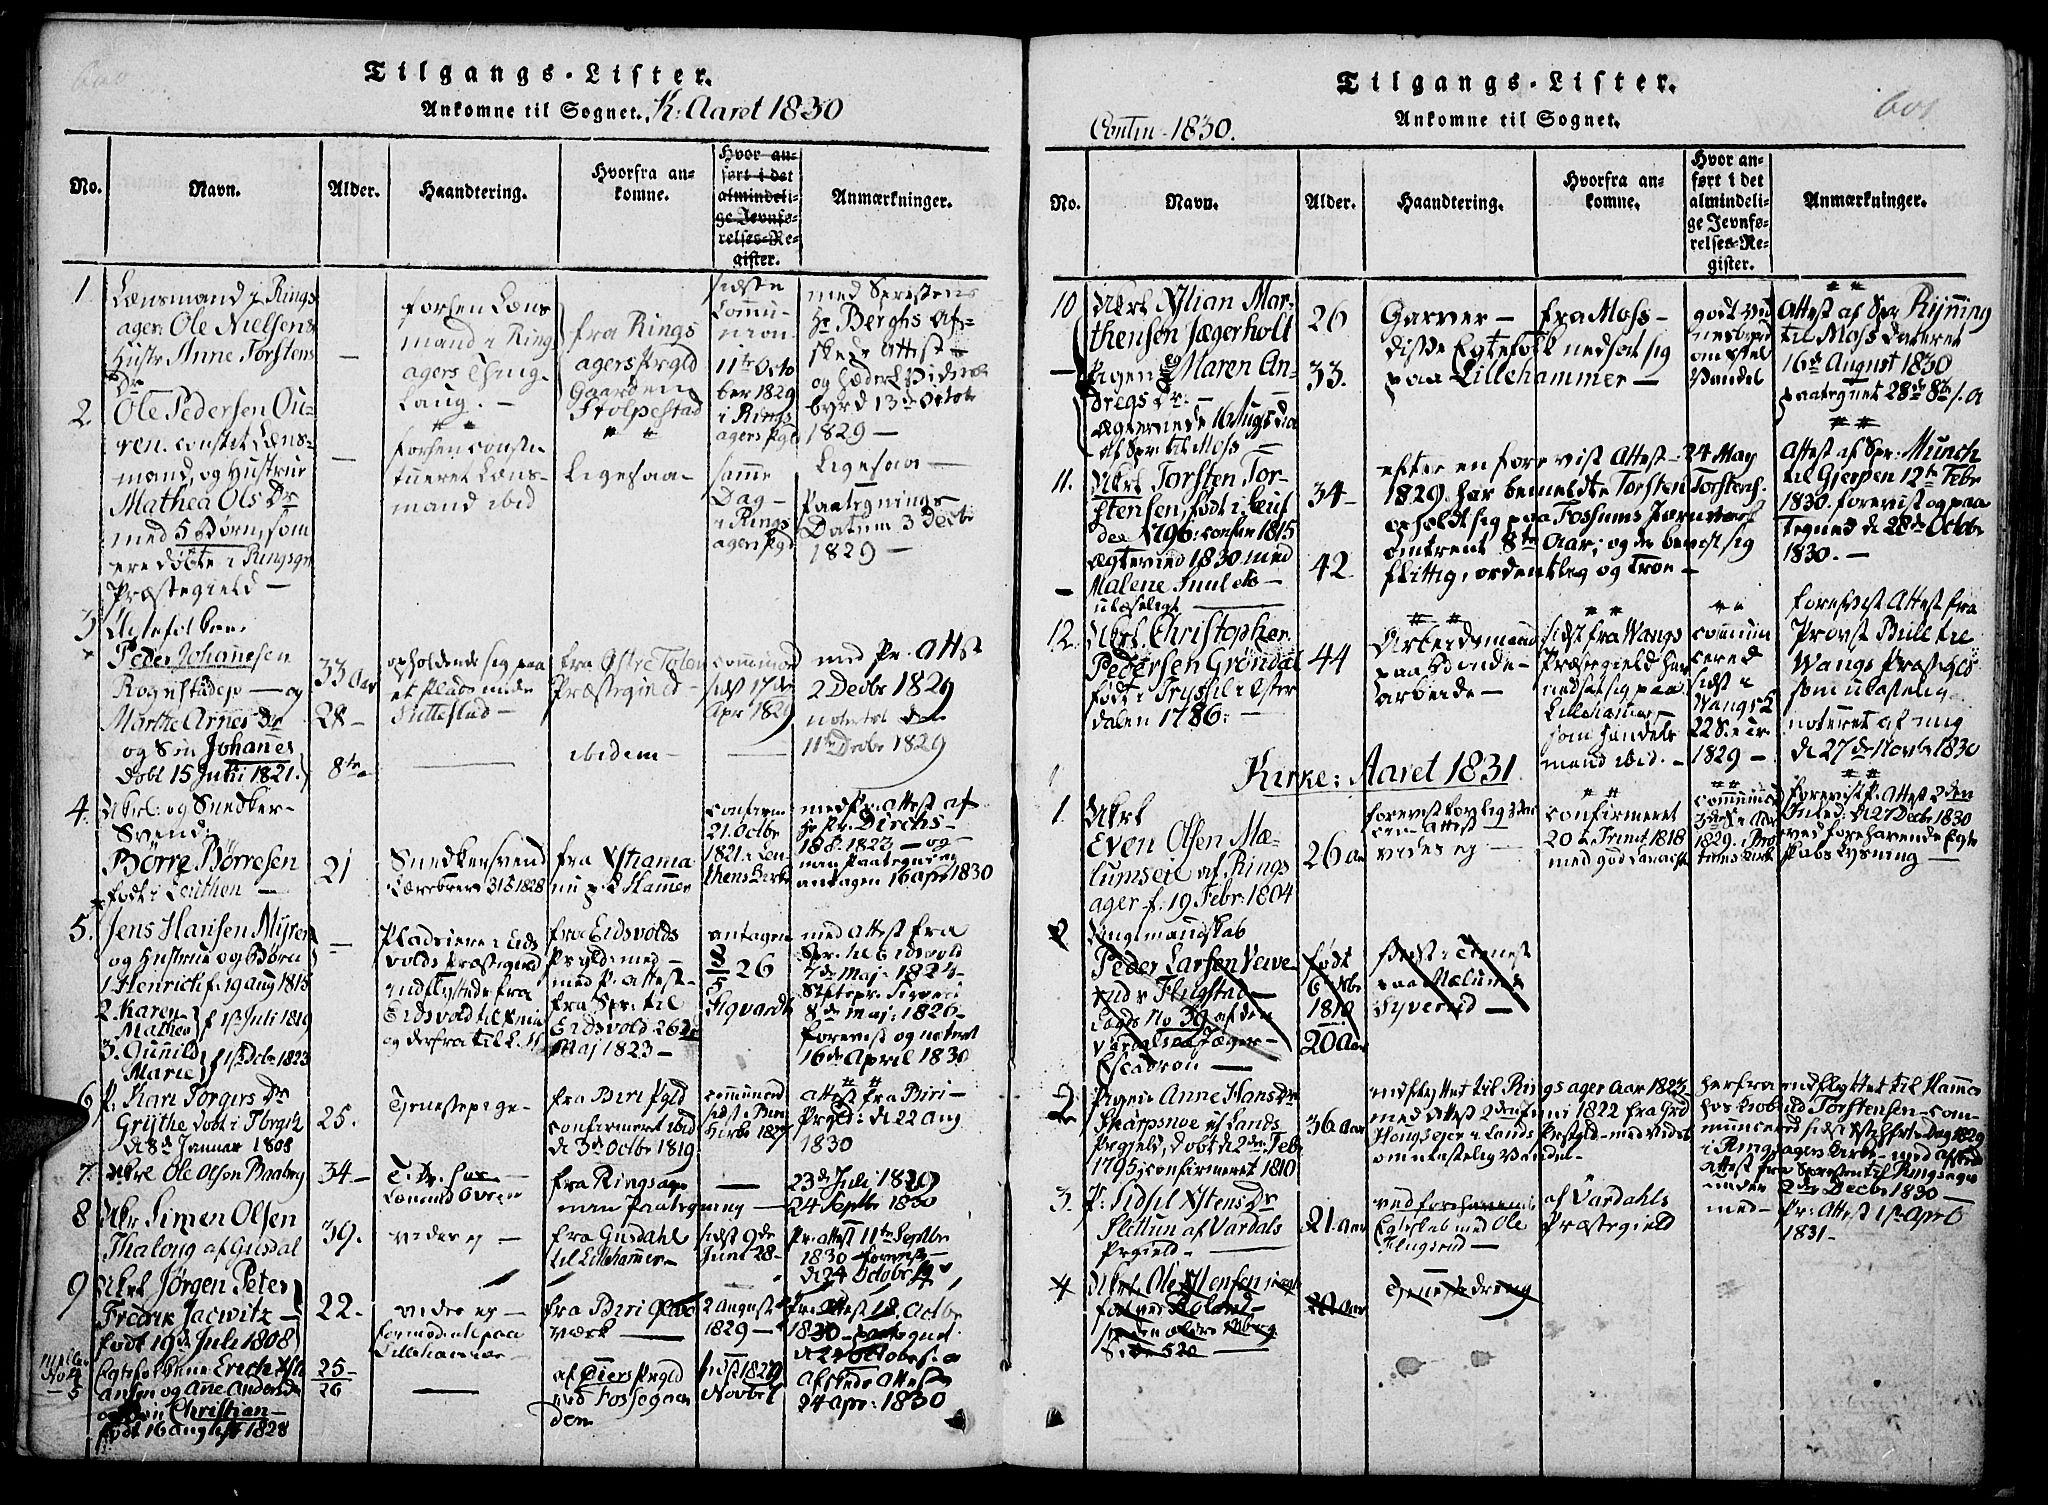 SAH, Fåberg prestekontor, Ministerialbok nr. 3, 1818-1833, s. 600-601